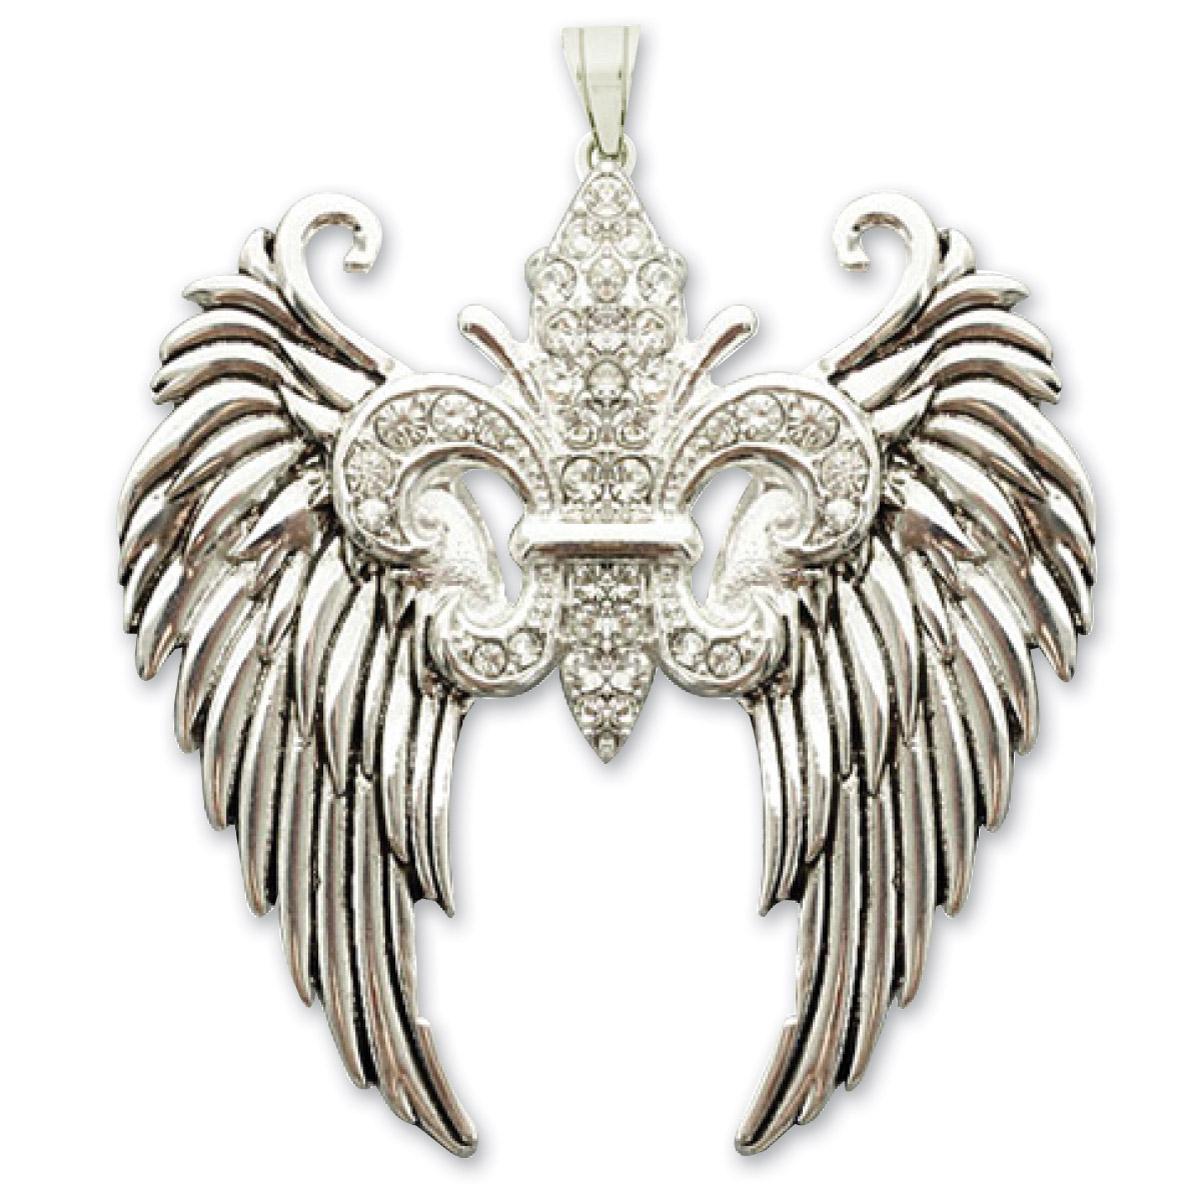 Hair Glove Angel Wings Fleur De Lis with Clear Stones Zipper Pull